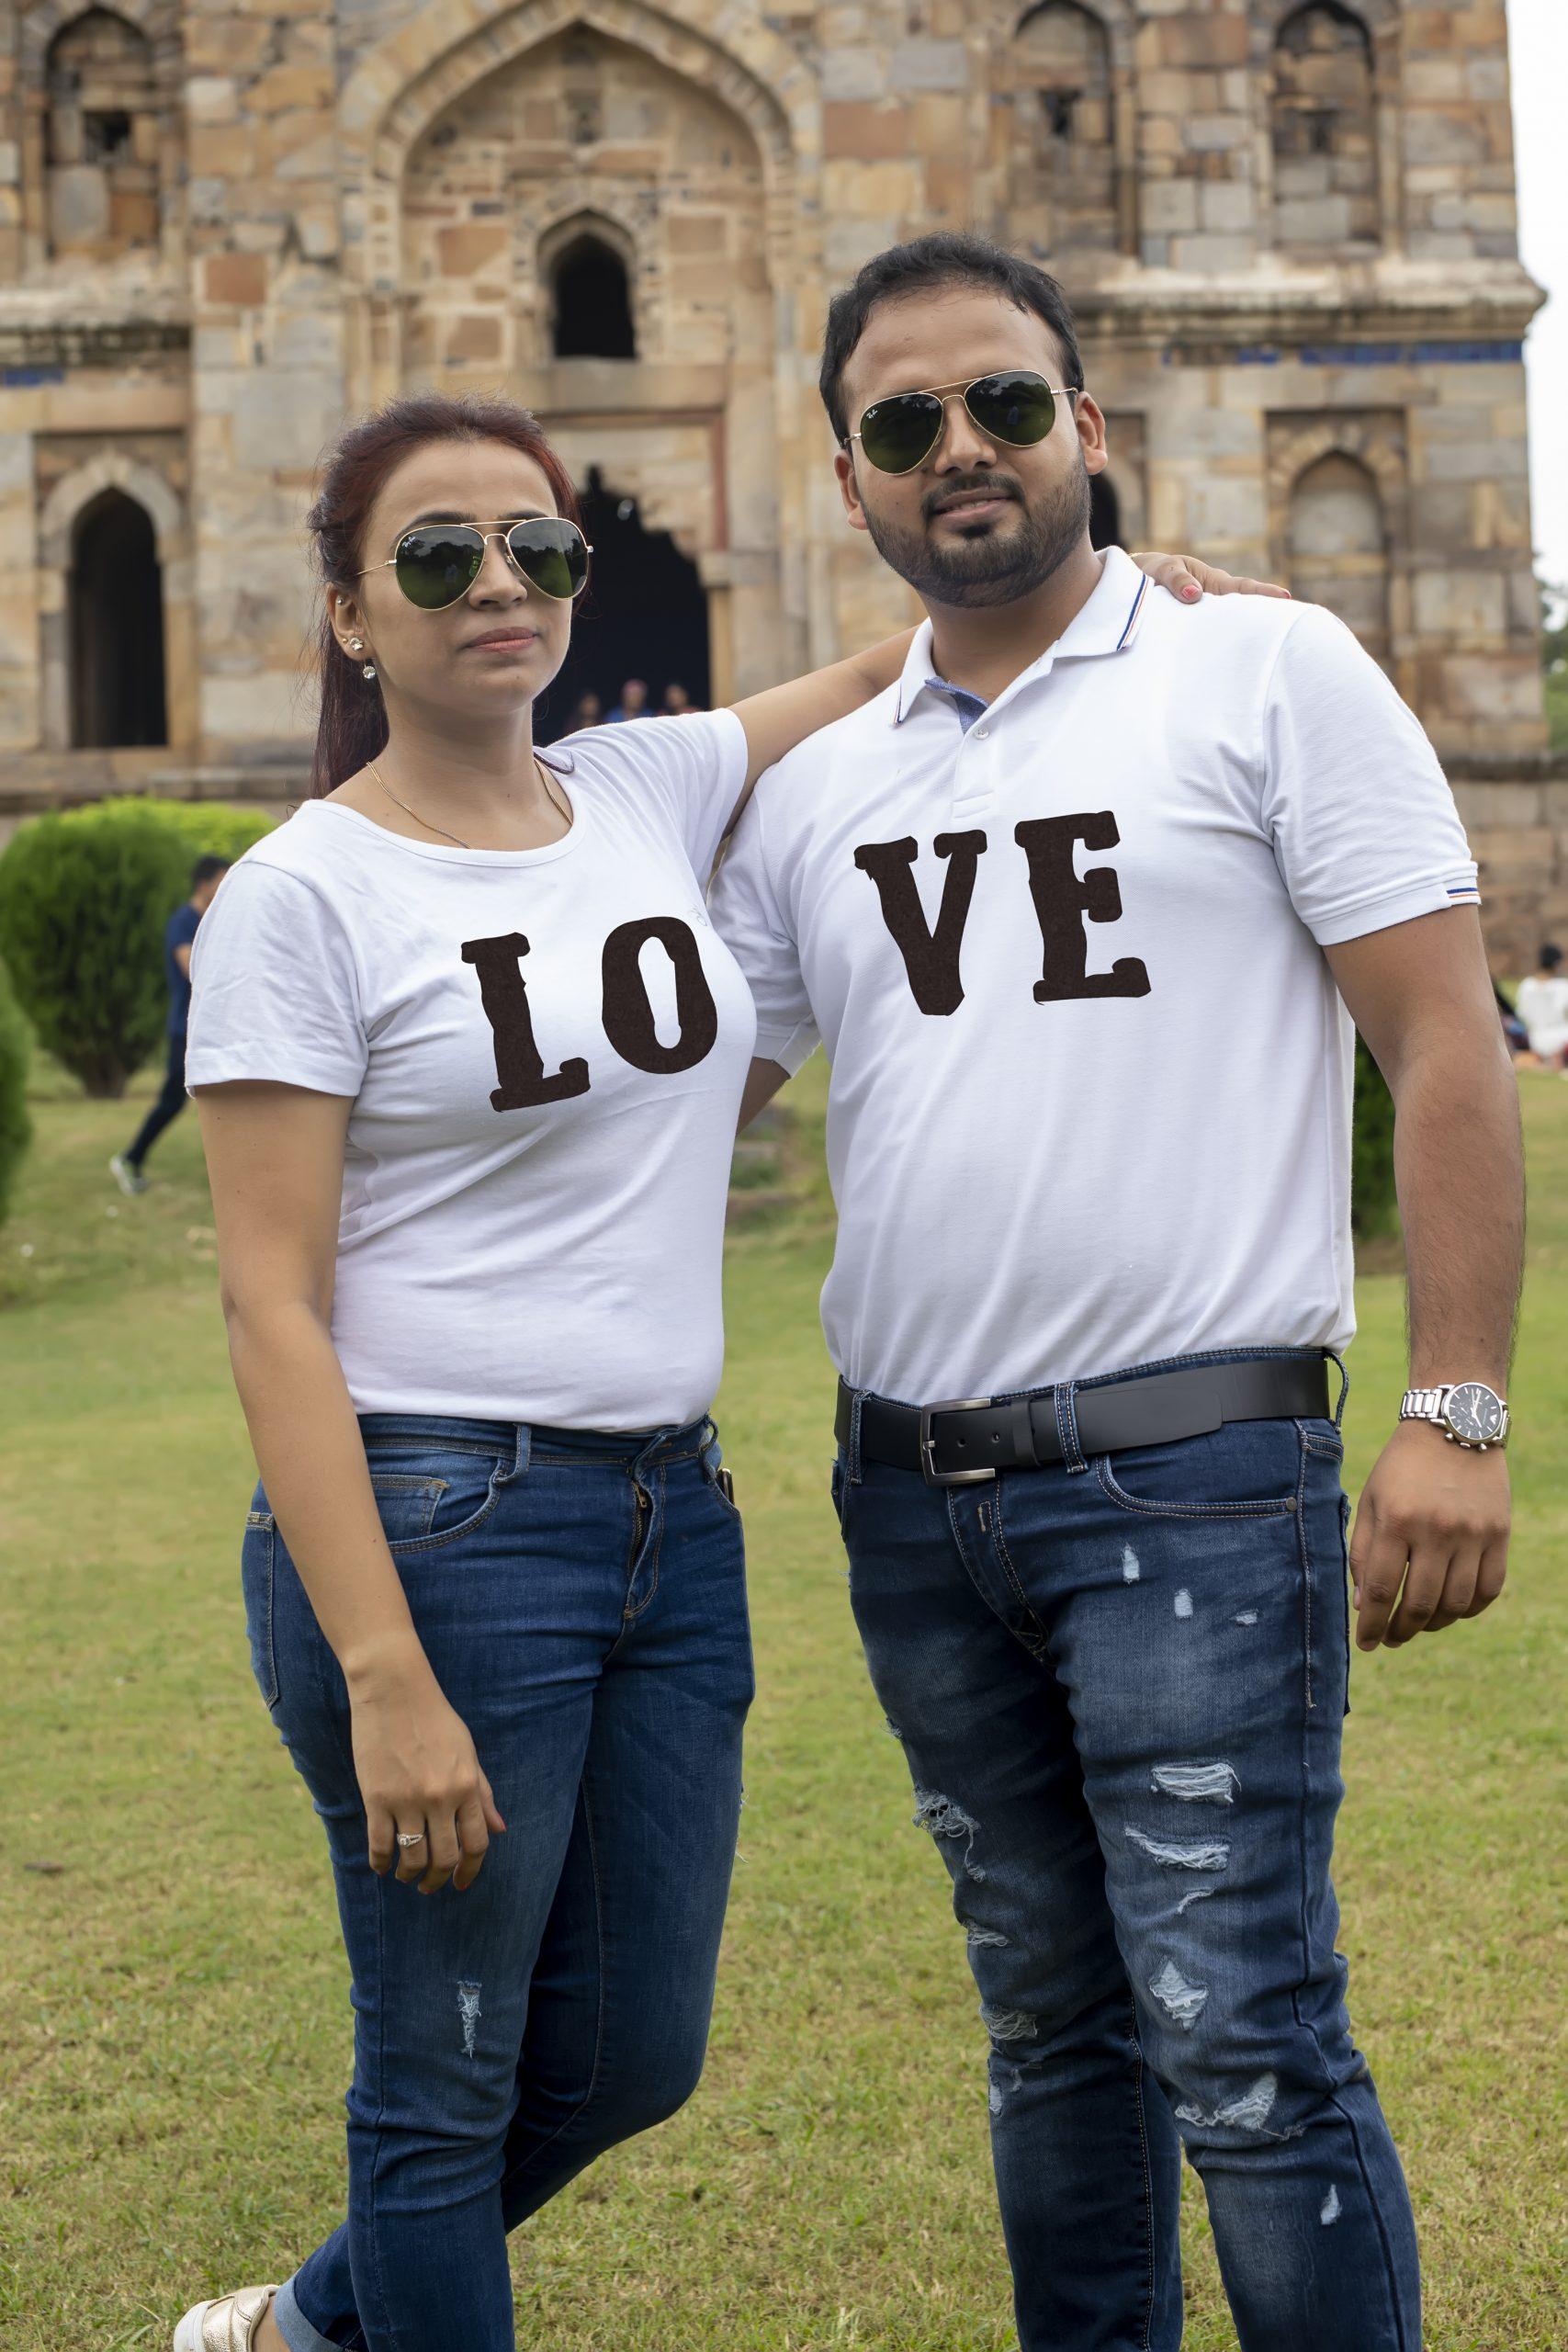 A couple's dress code